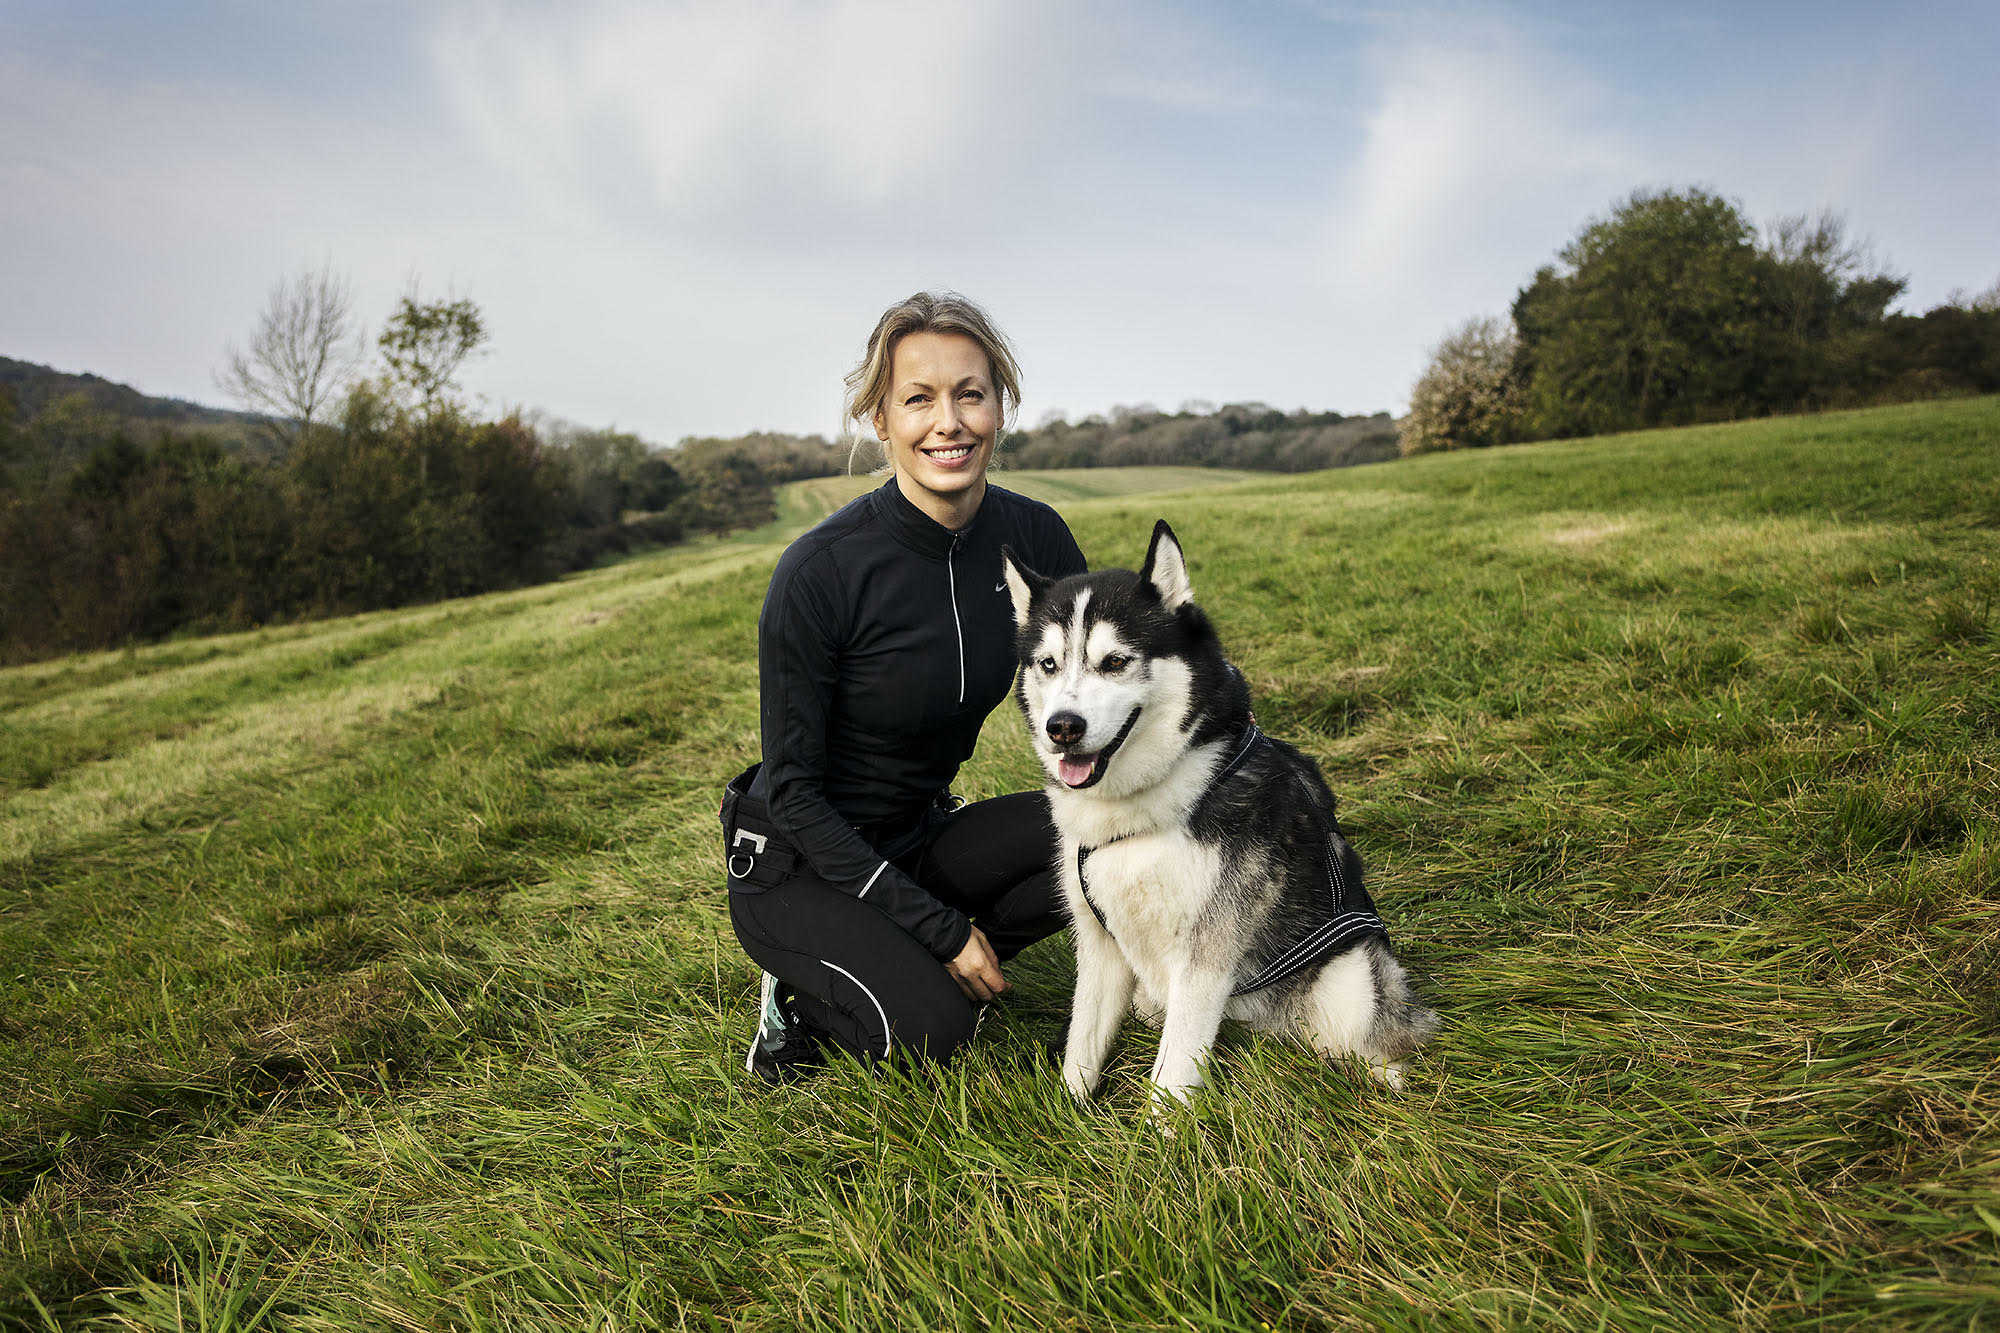 Karan Kapoor - woman and dog in field